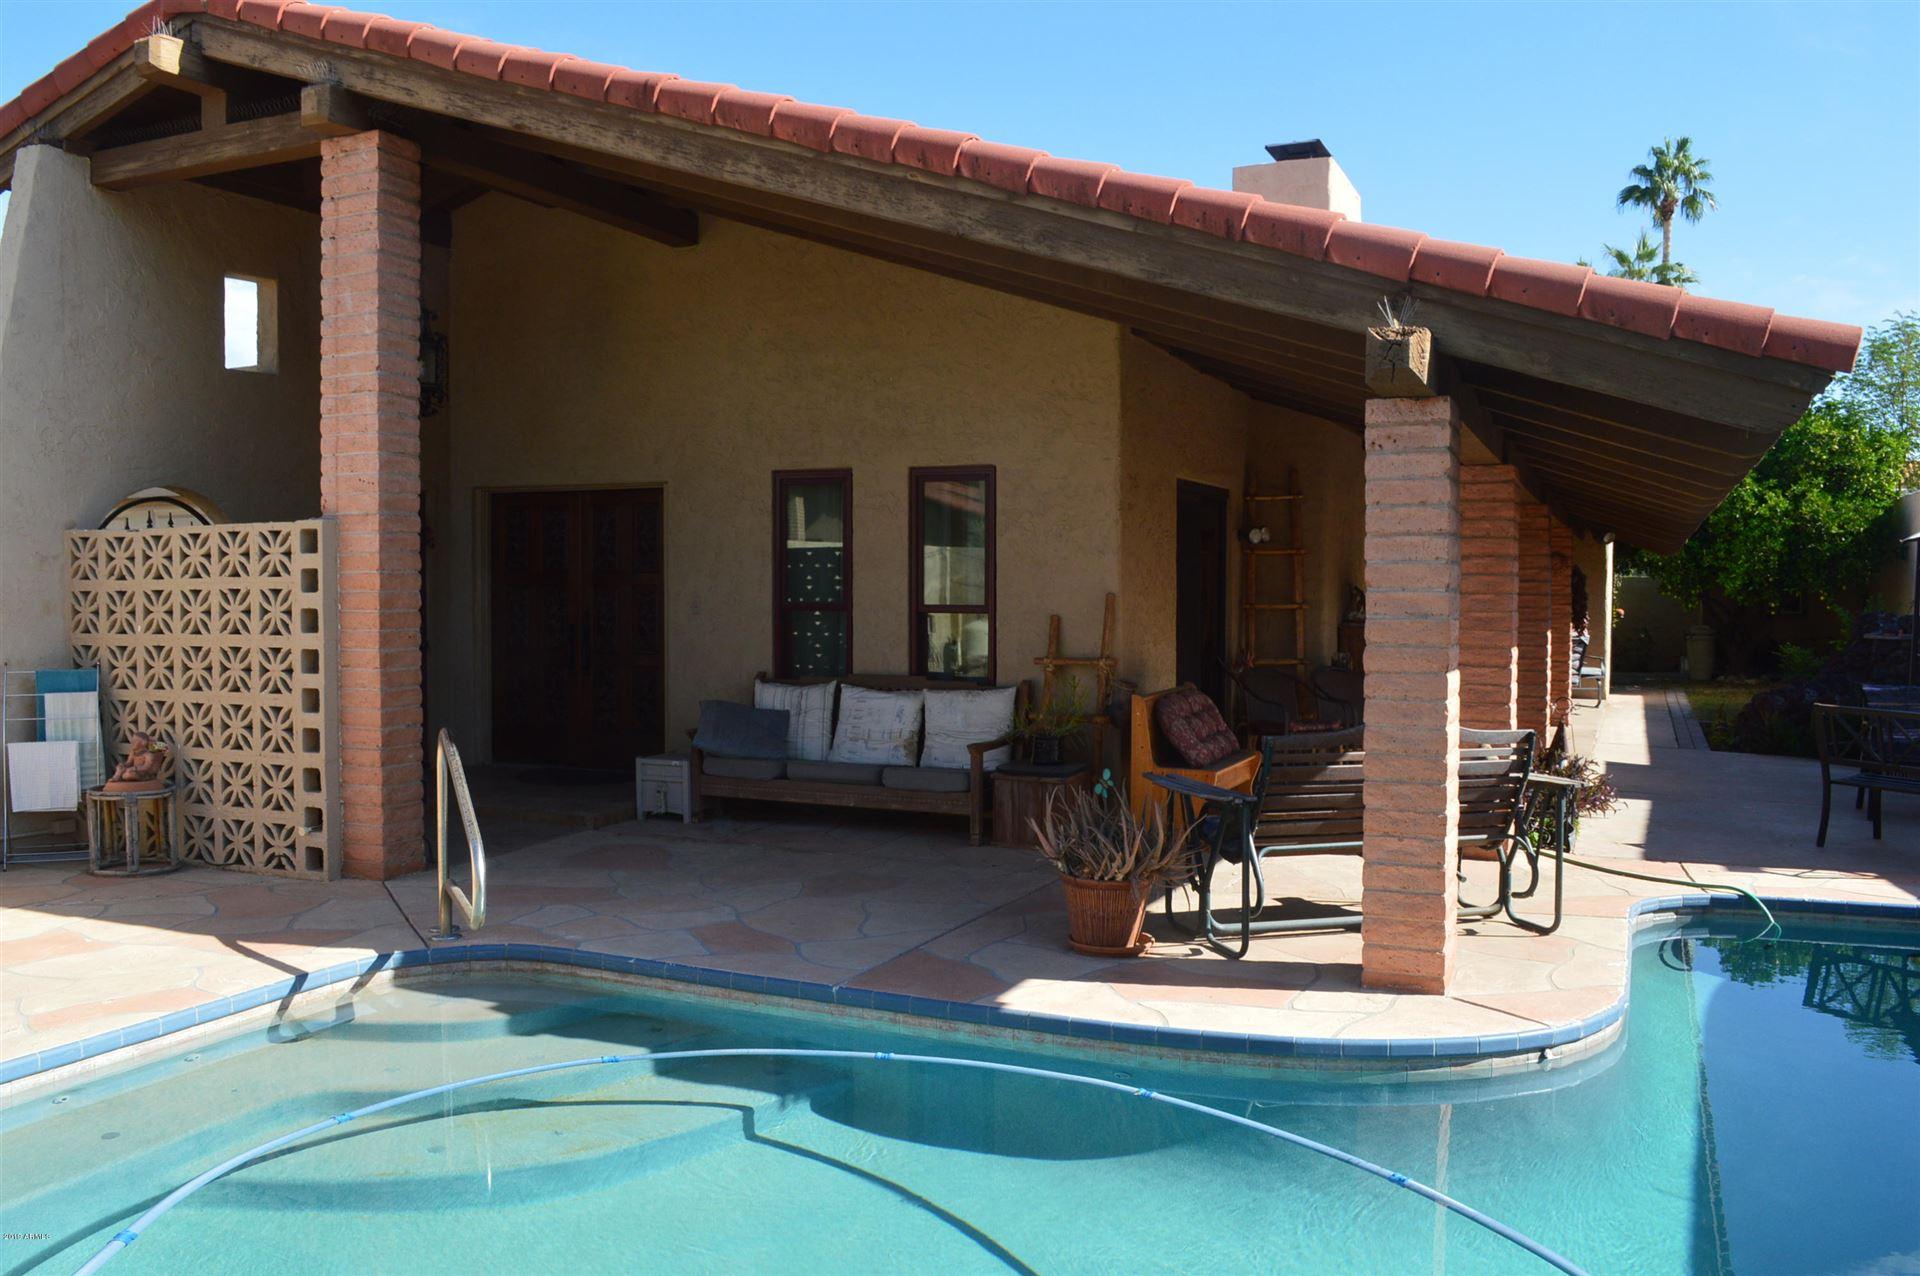 Photo of 2847 N 77TH Place, Scottsdale, AZ 85257 (MLS # 6003340)